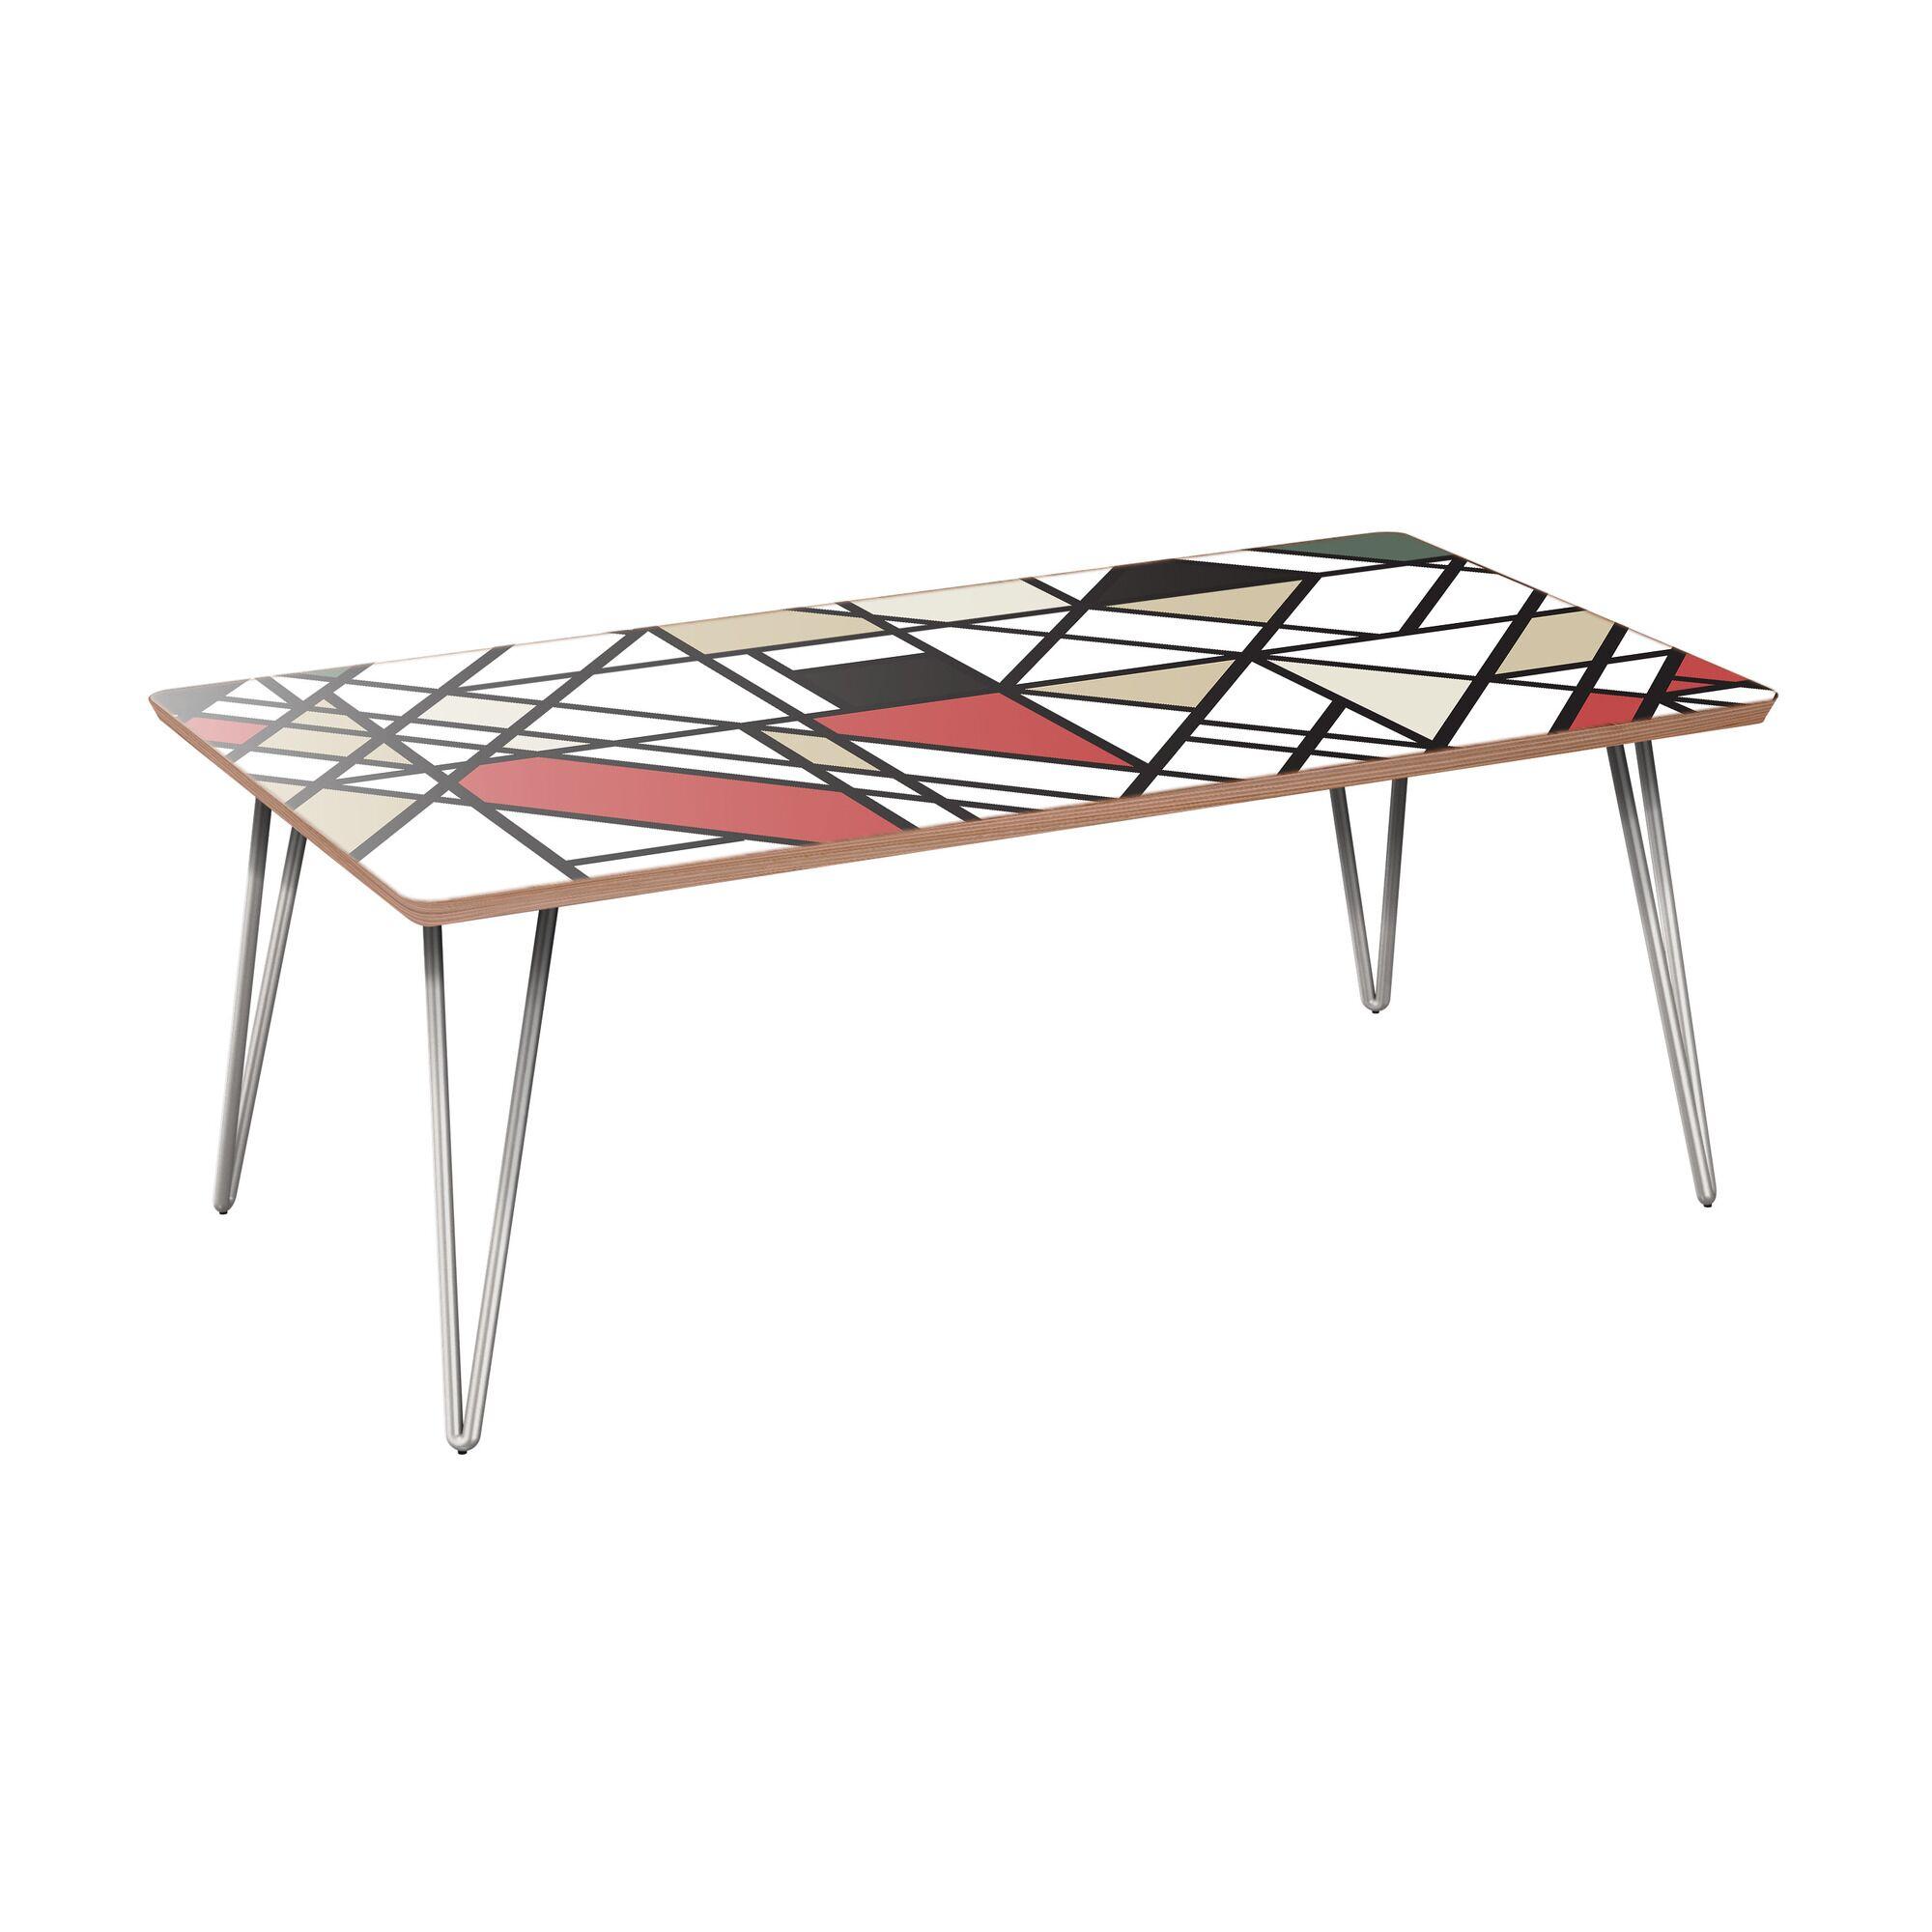 Johathan Coffee Table Table Base Color: Chrome, Table Top Color: Walnut